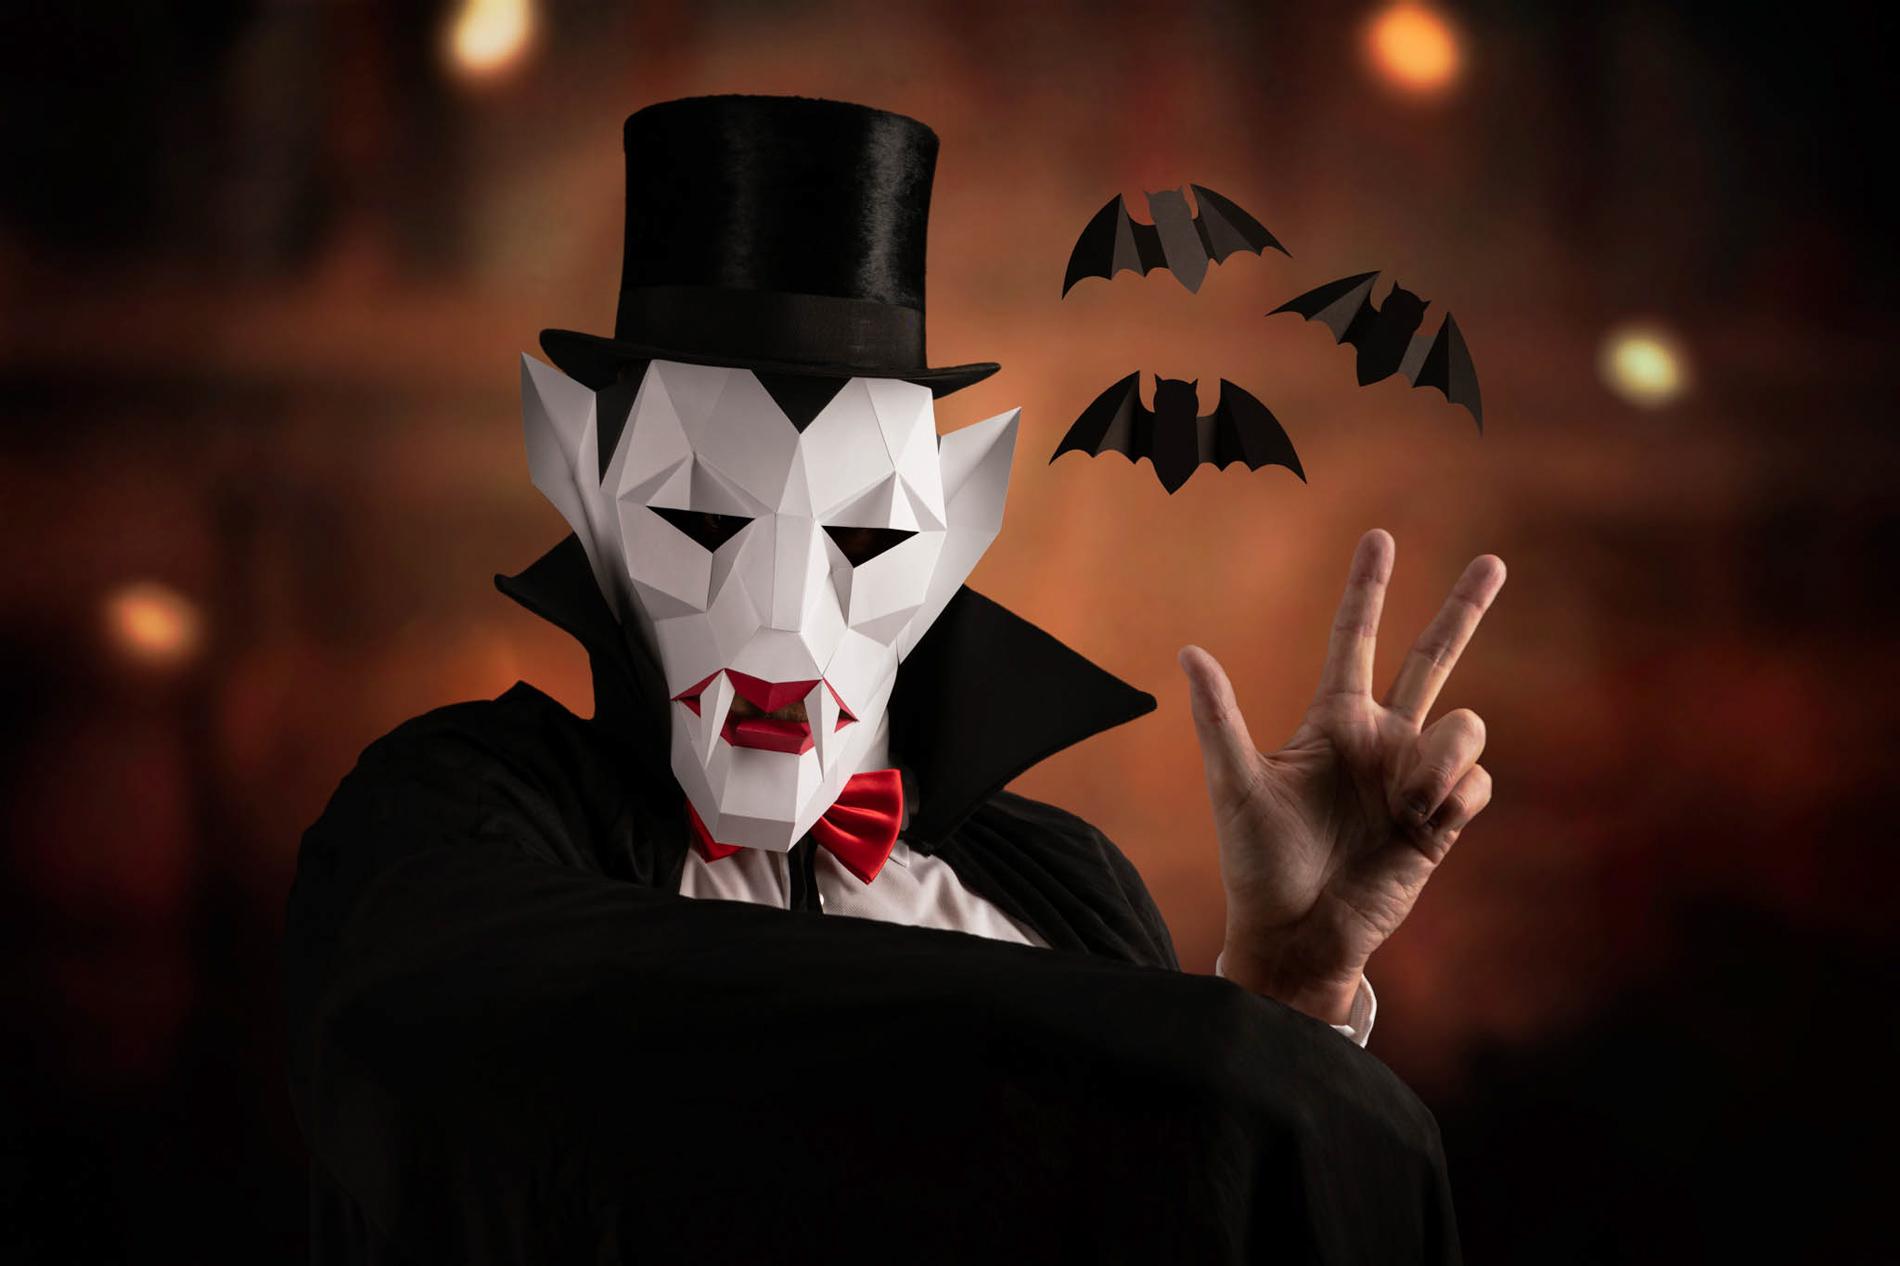 Dracula with 3 bats